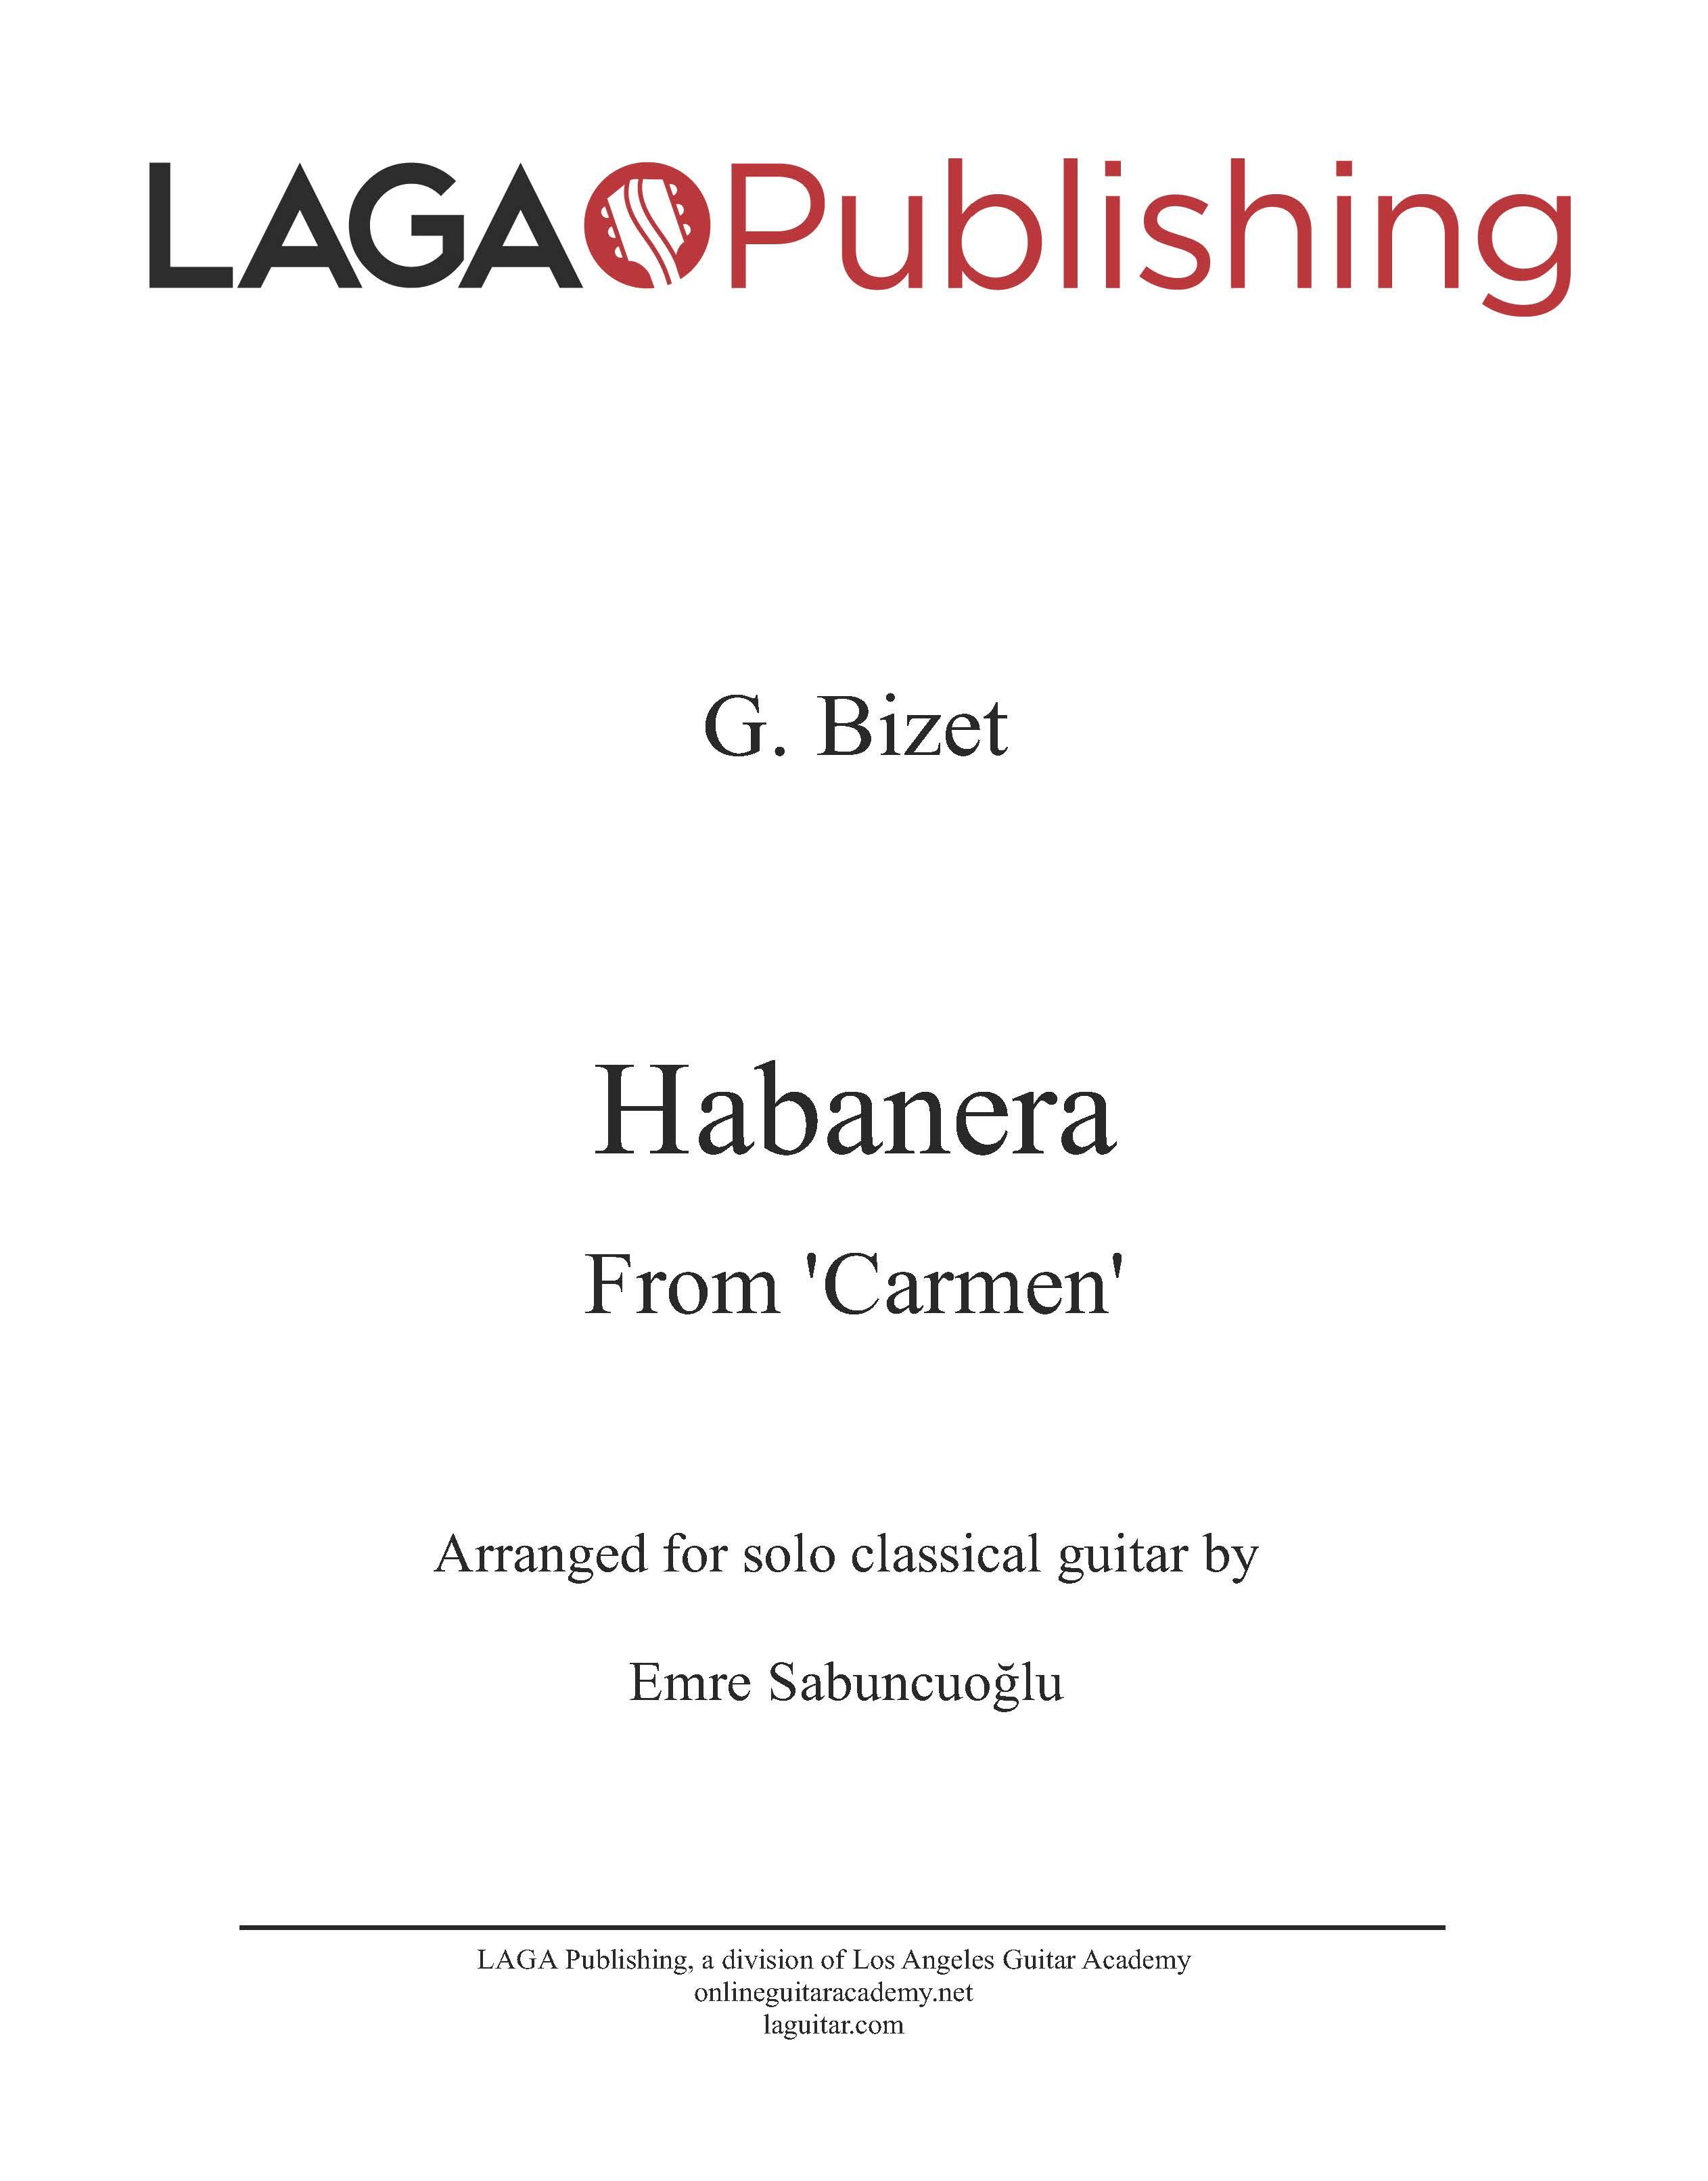 LAGA-Publishing-Bizet-Carmen-Habanera-Score-and-Tab